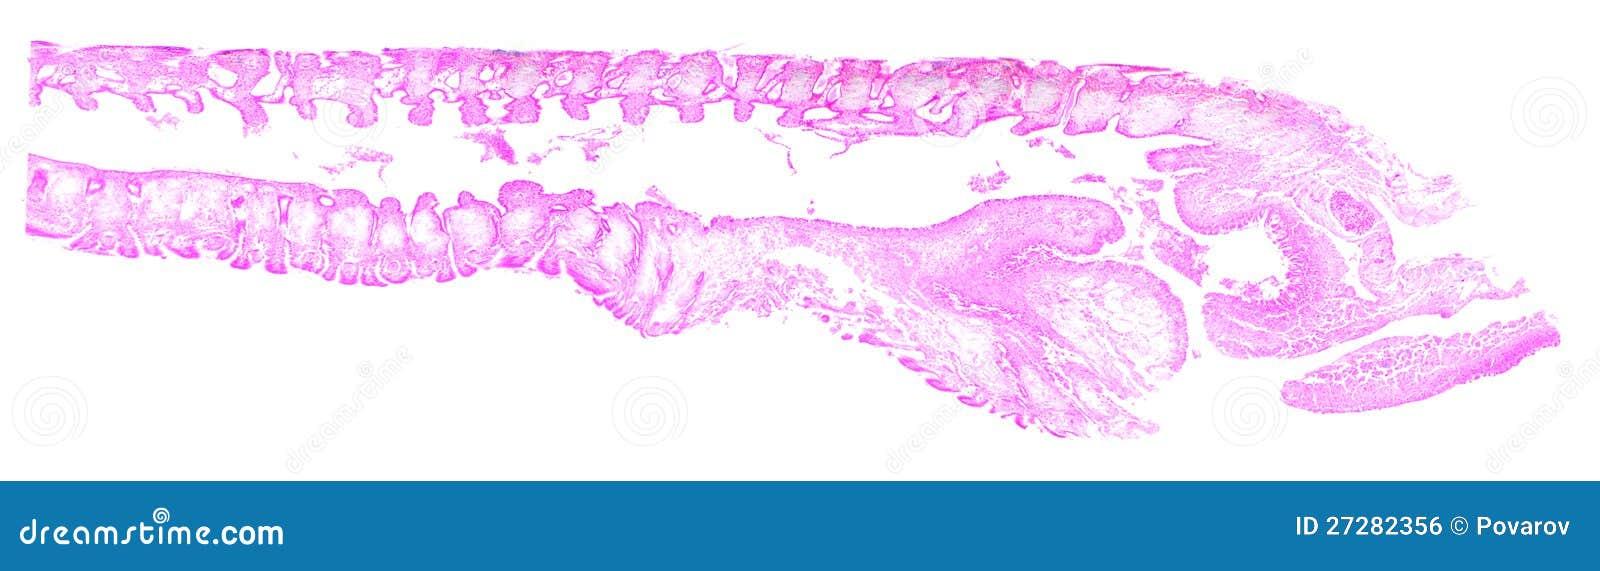 Musslagäl under mikroskopet